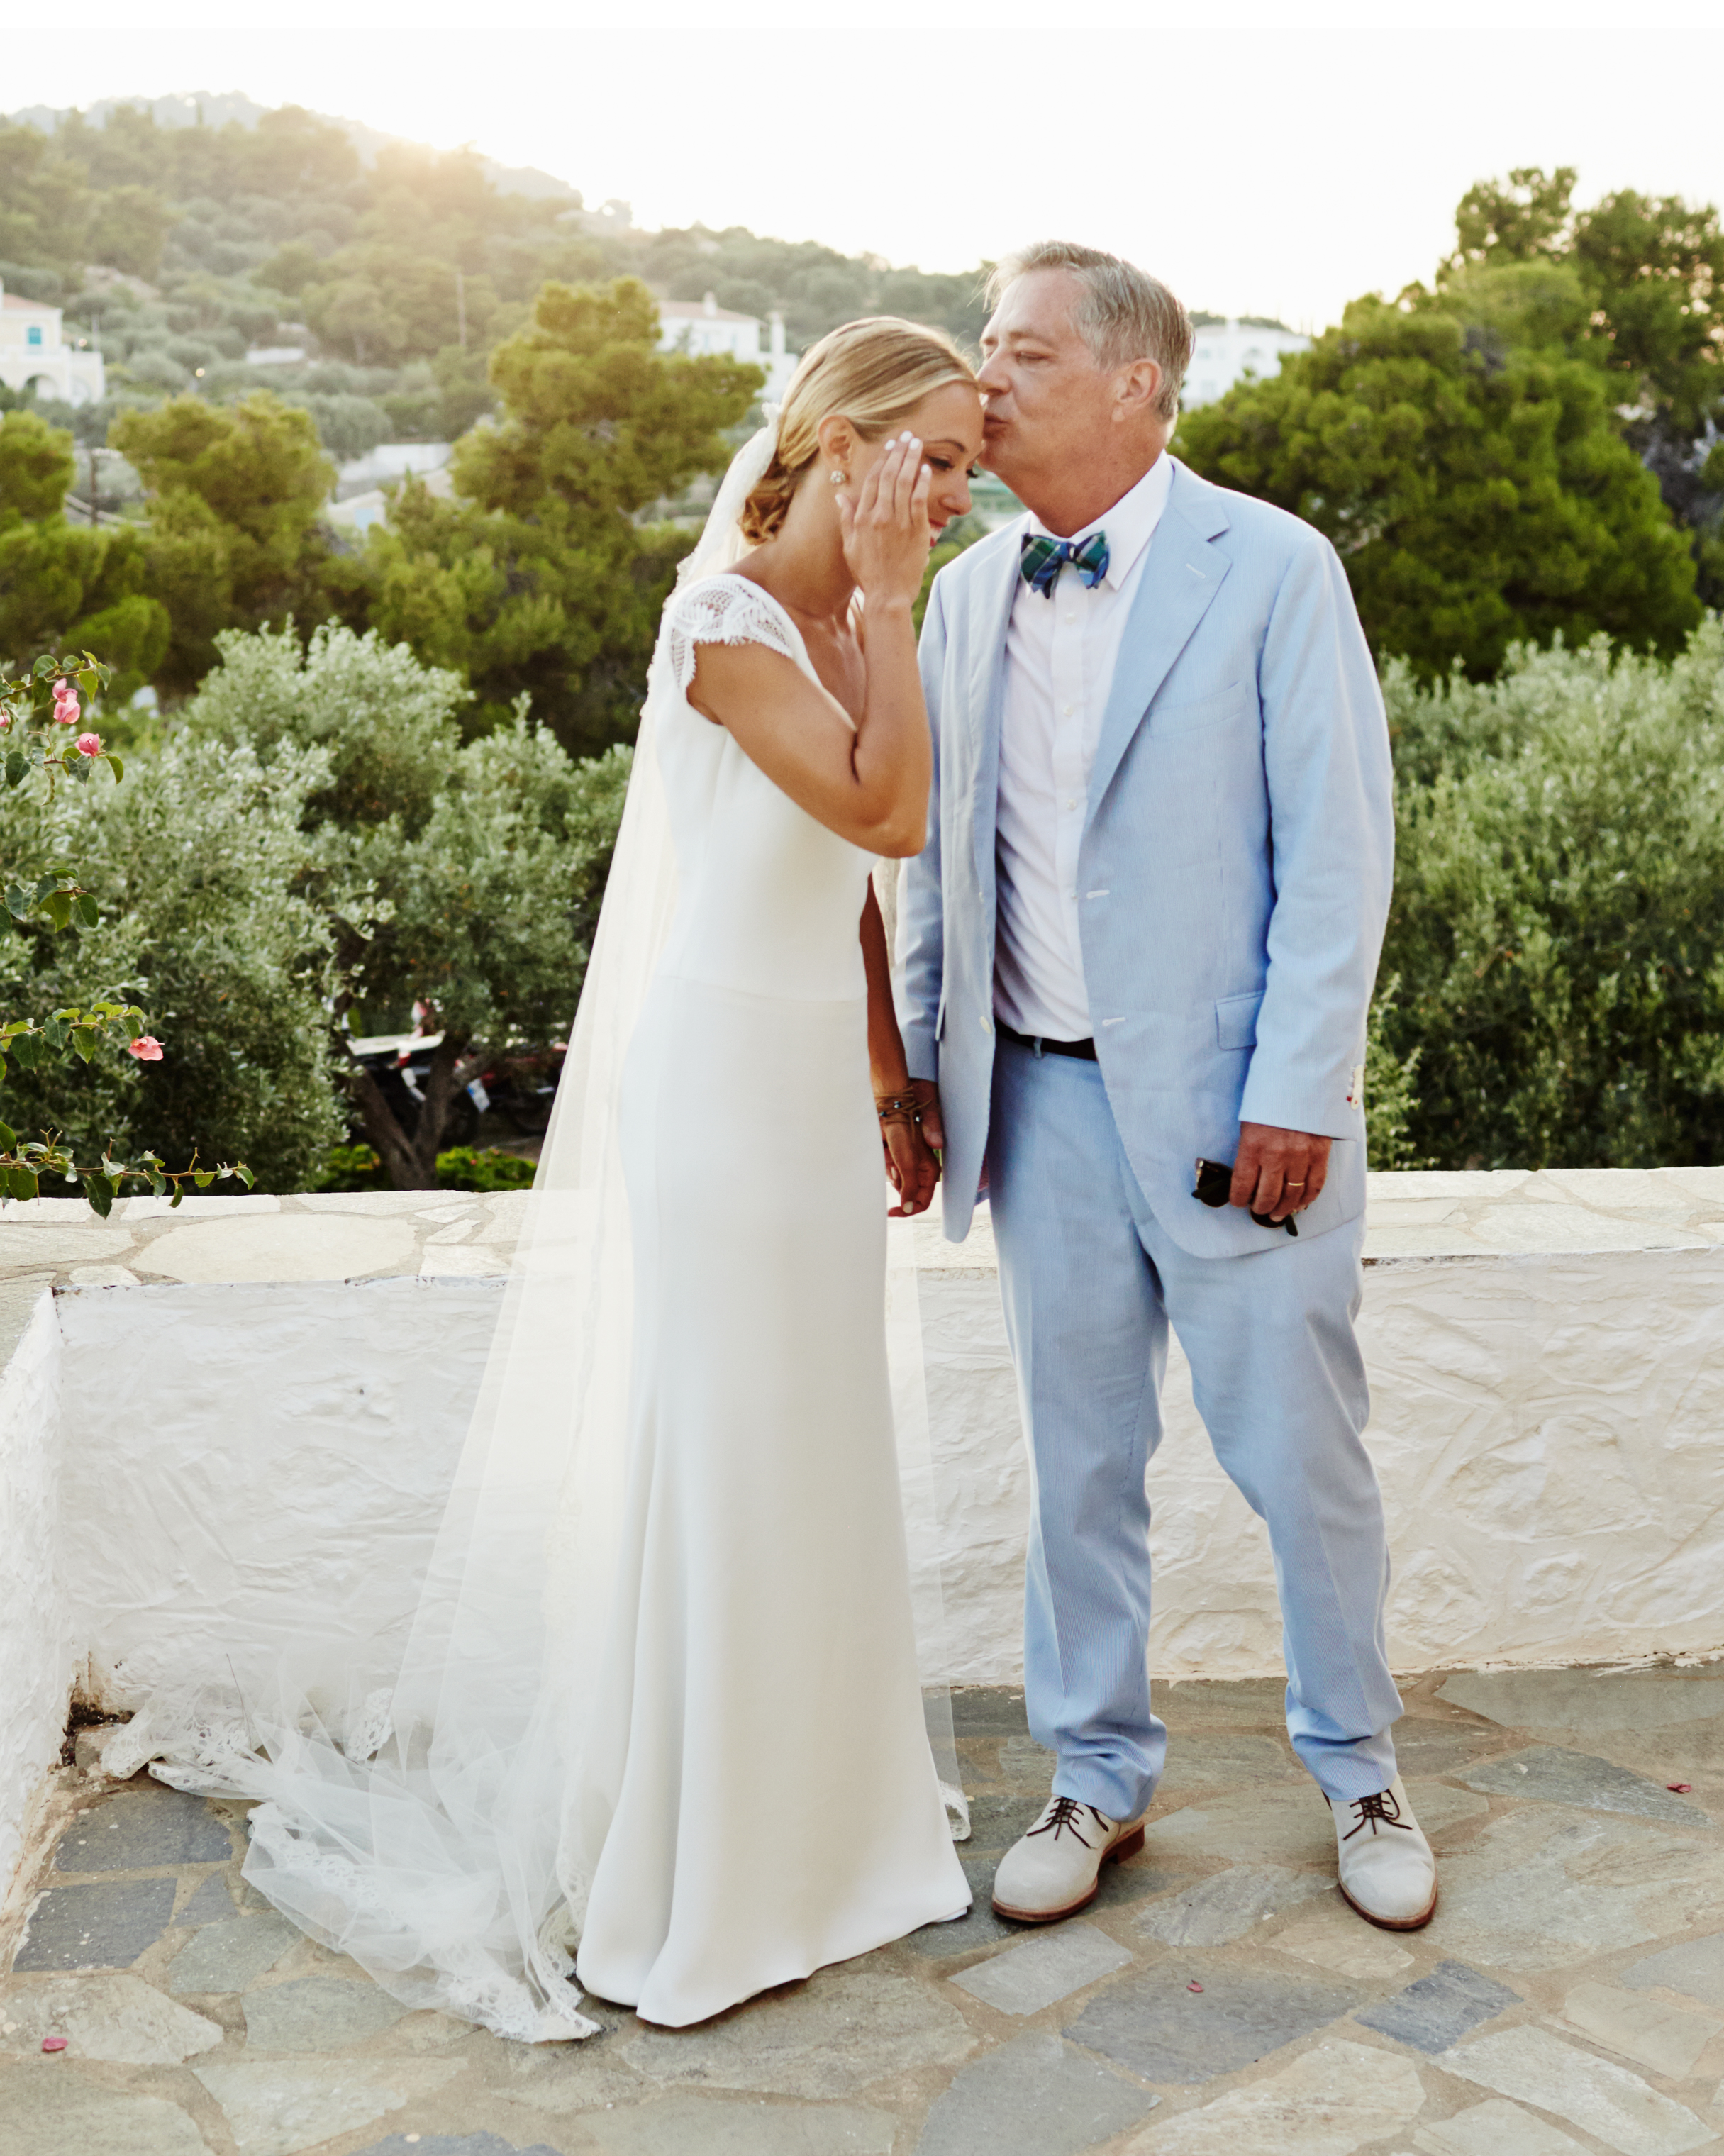 ana-alden-wedding-greece-611a4331-s111821.jpg